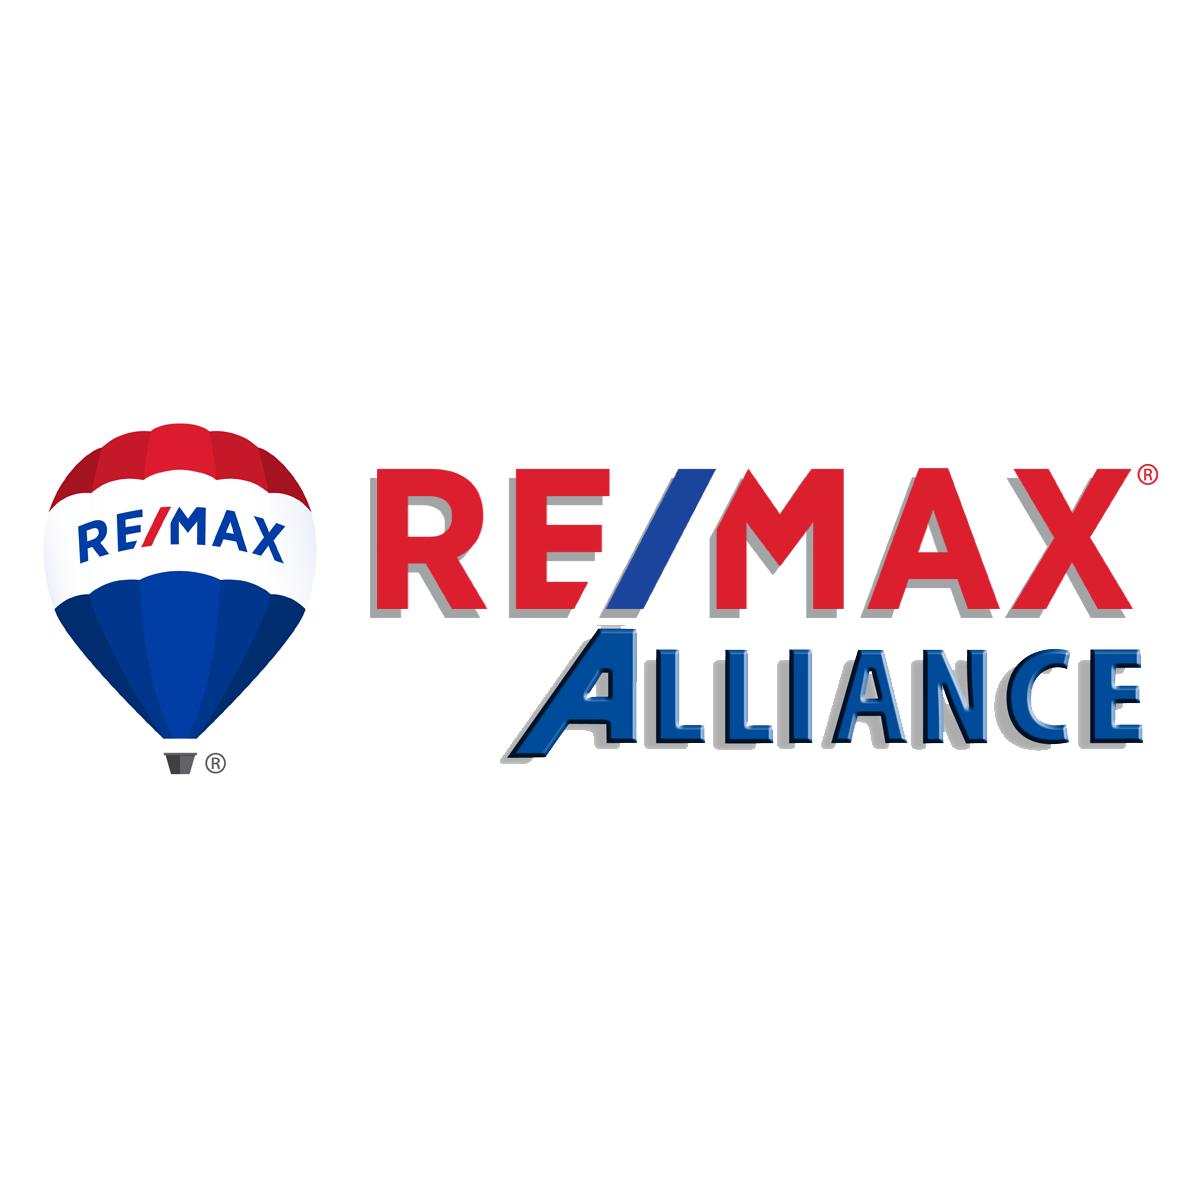 Marie Lynch | RE/MAX Alliance